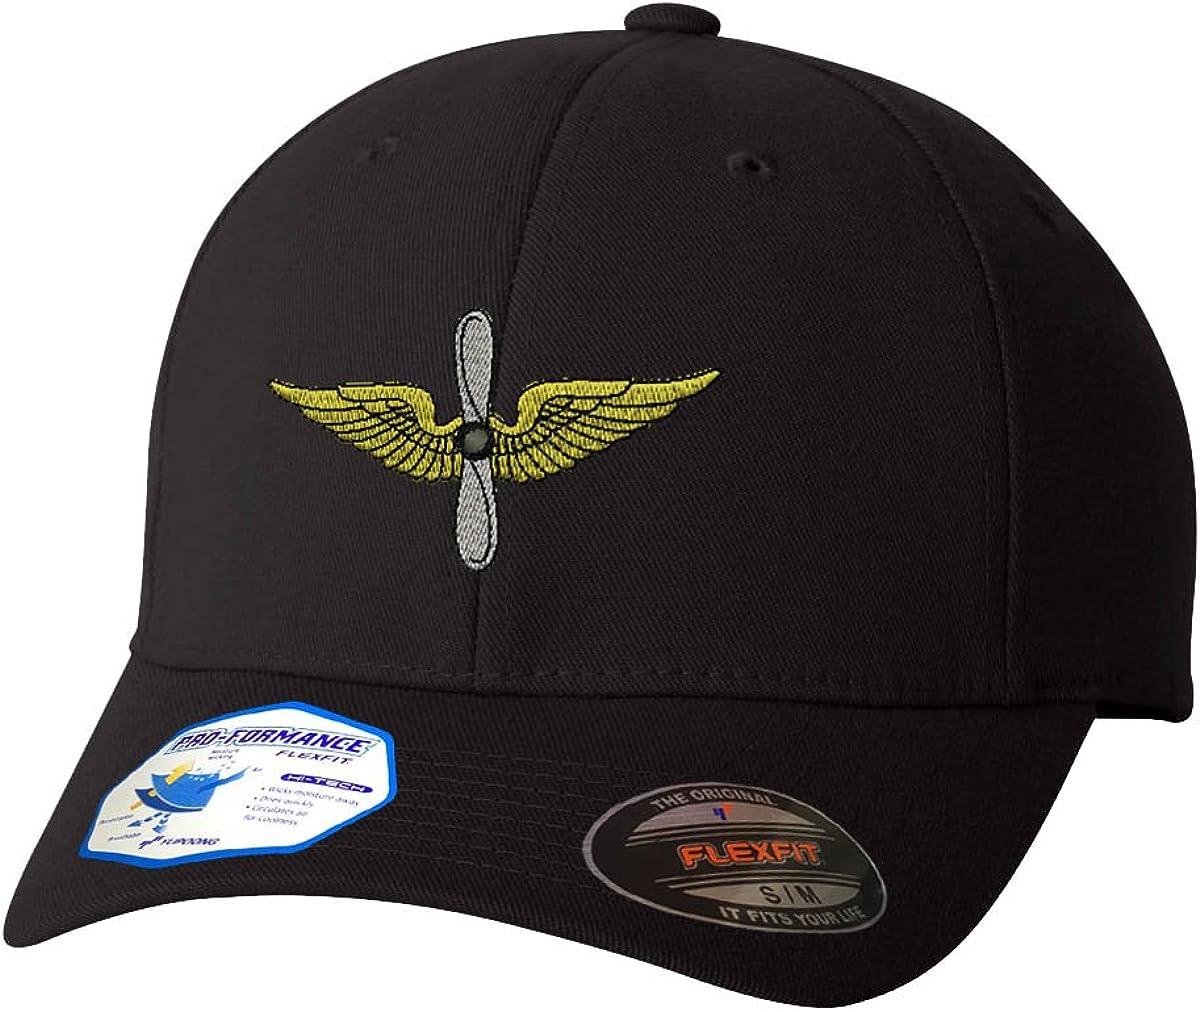 Army Aviation Flexfit Adult Pro-Formance Branded Hat Black Large/X-Large